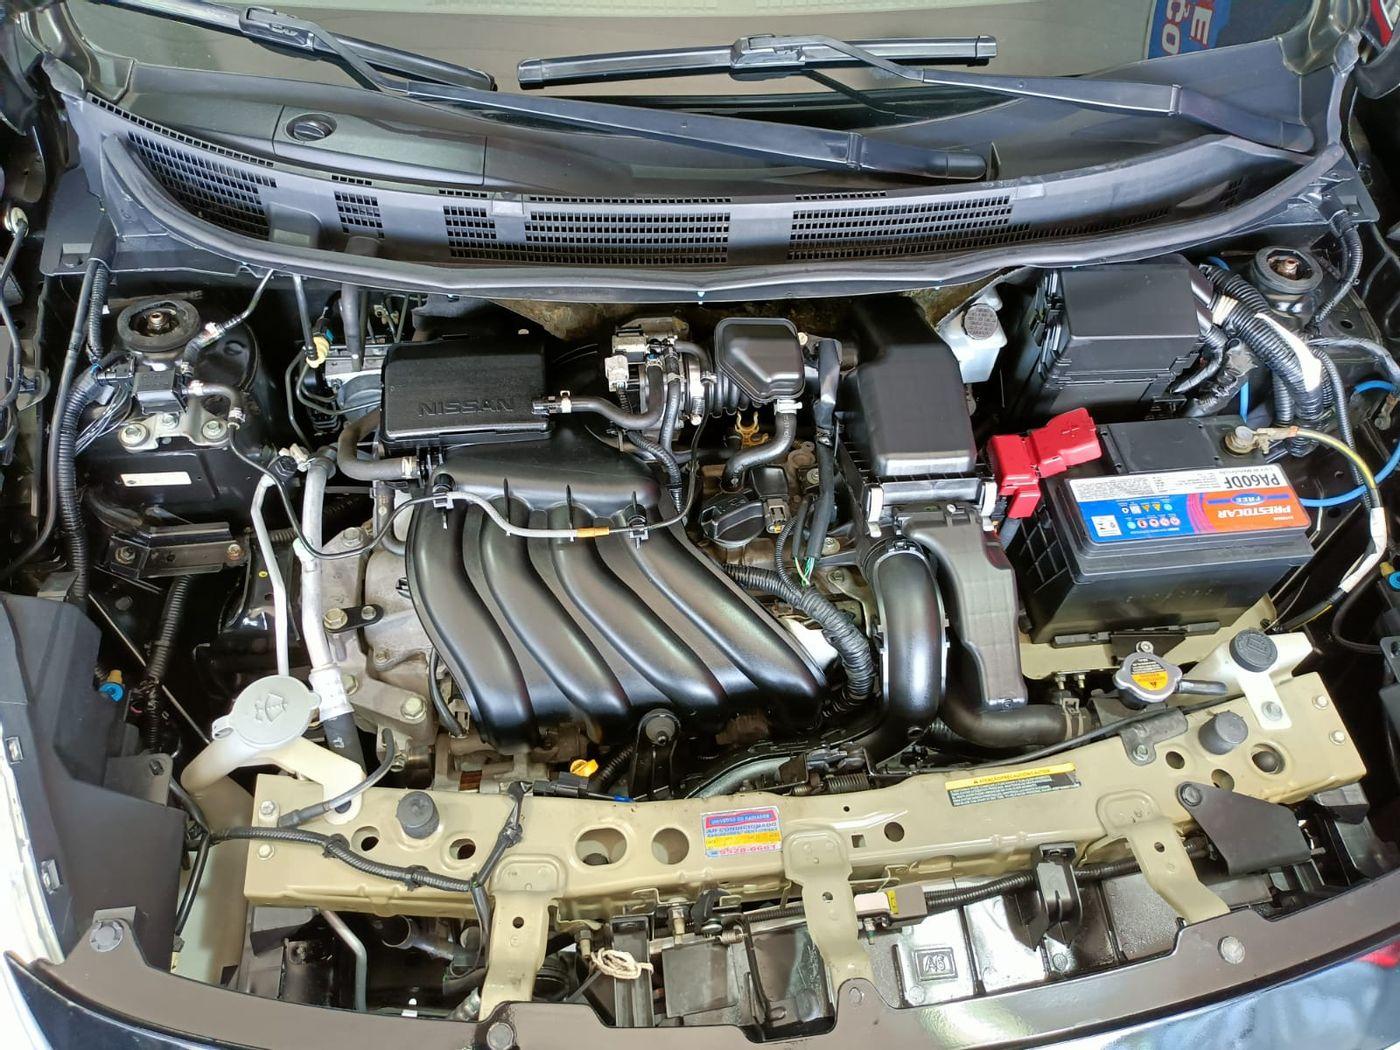 Nissan VERSA S 1.6 16V Flex Fuel 4p Mec.